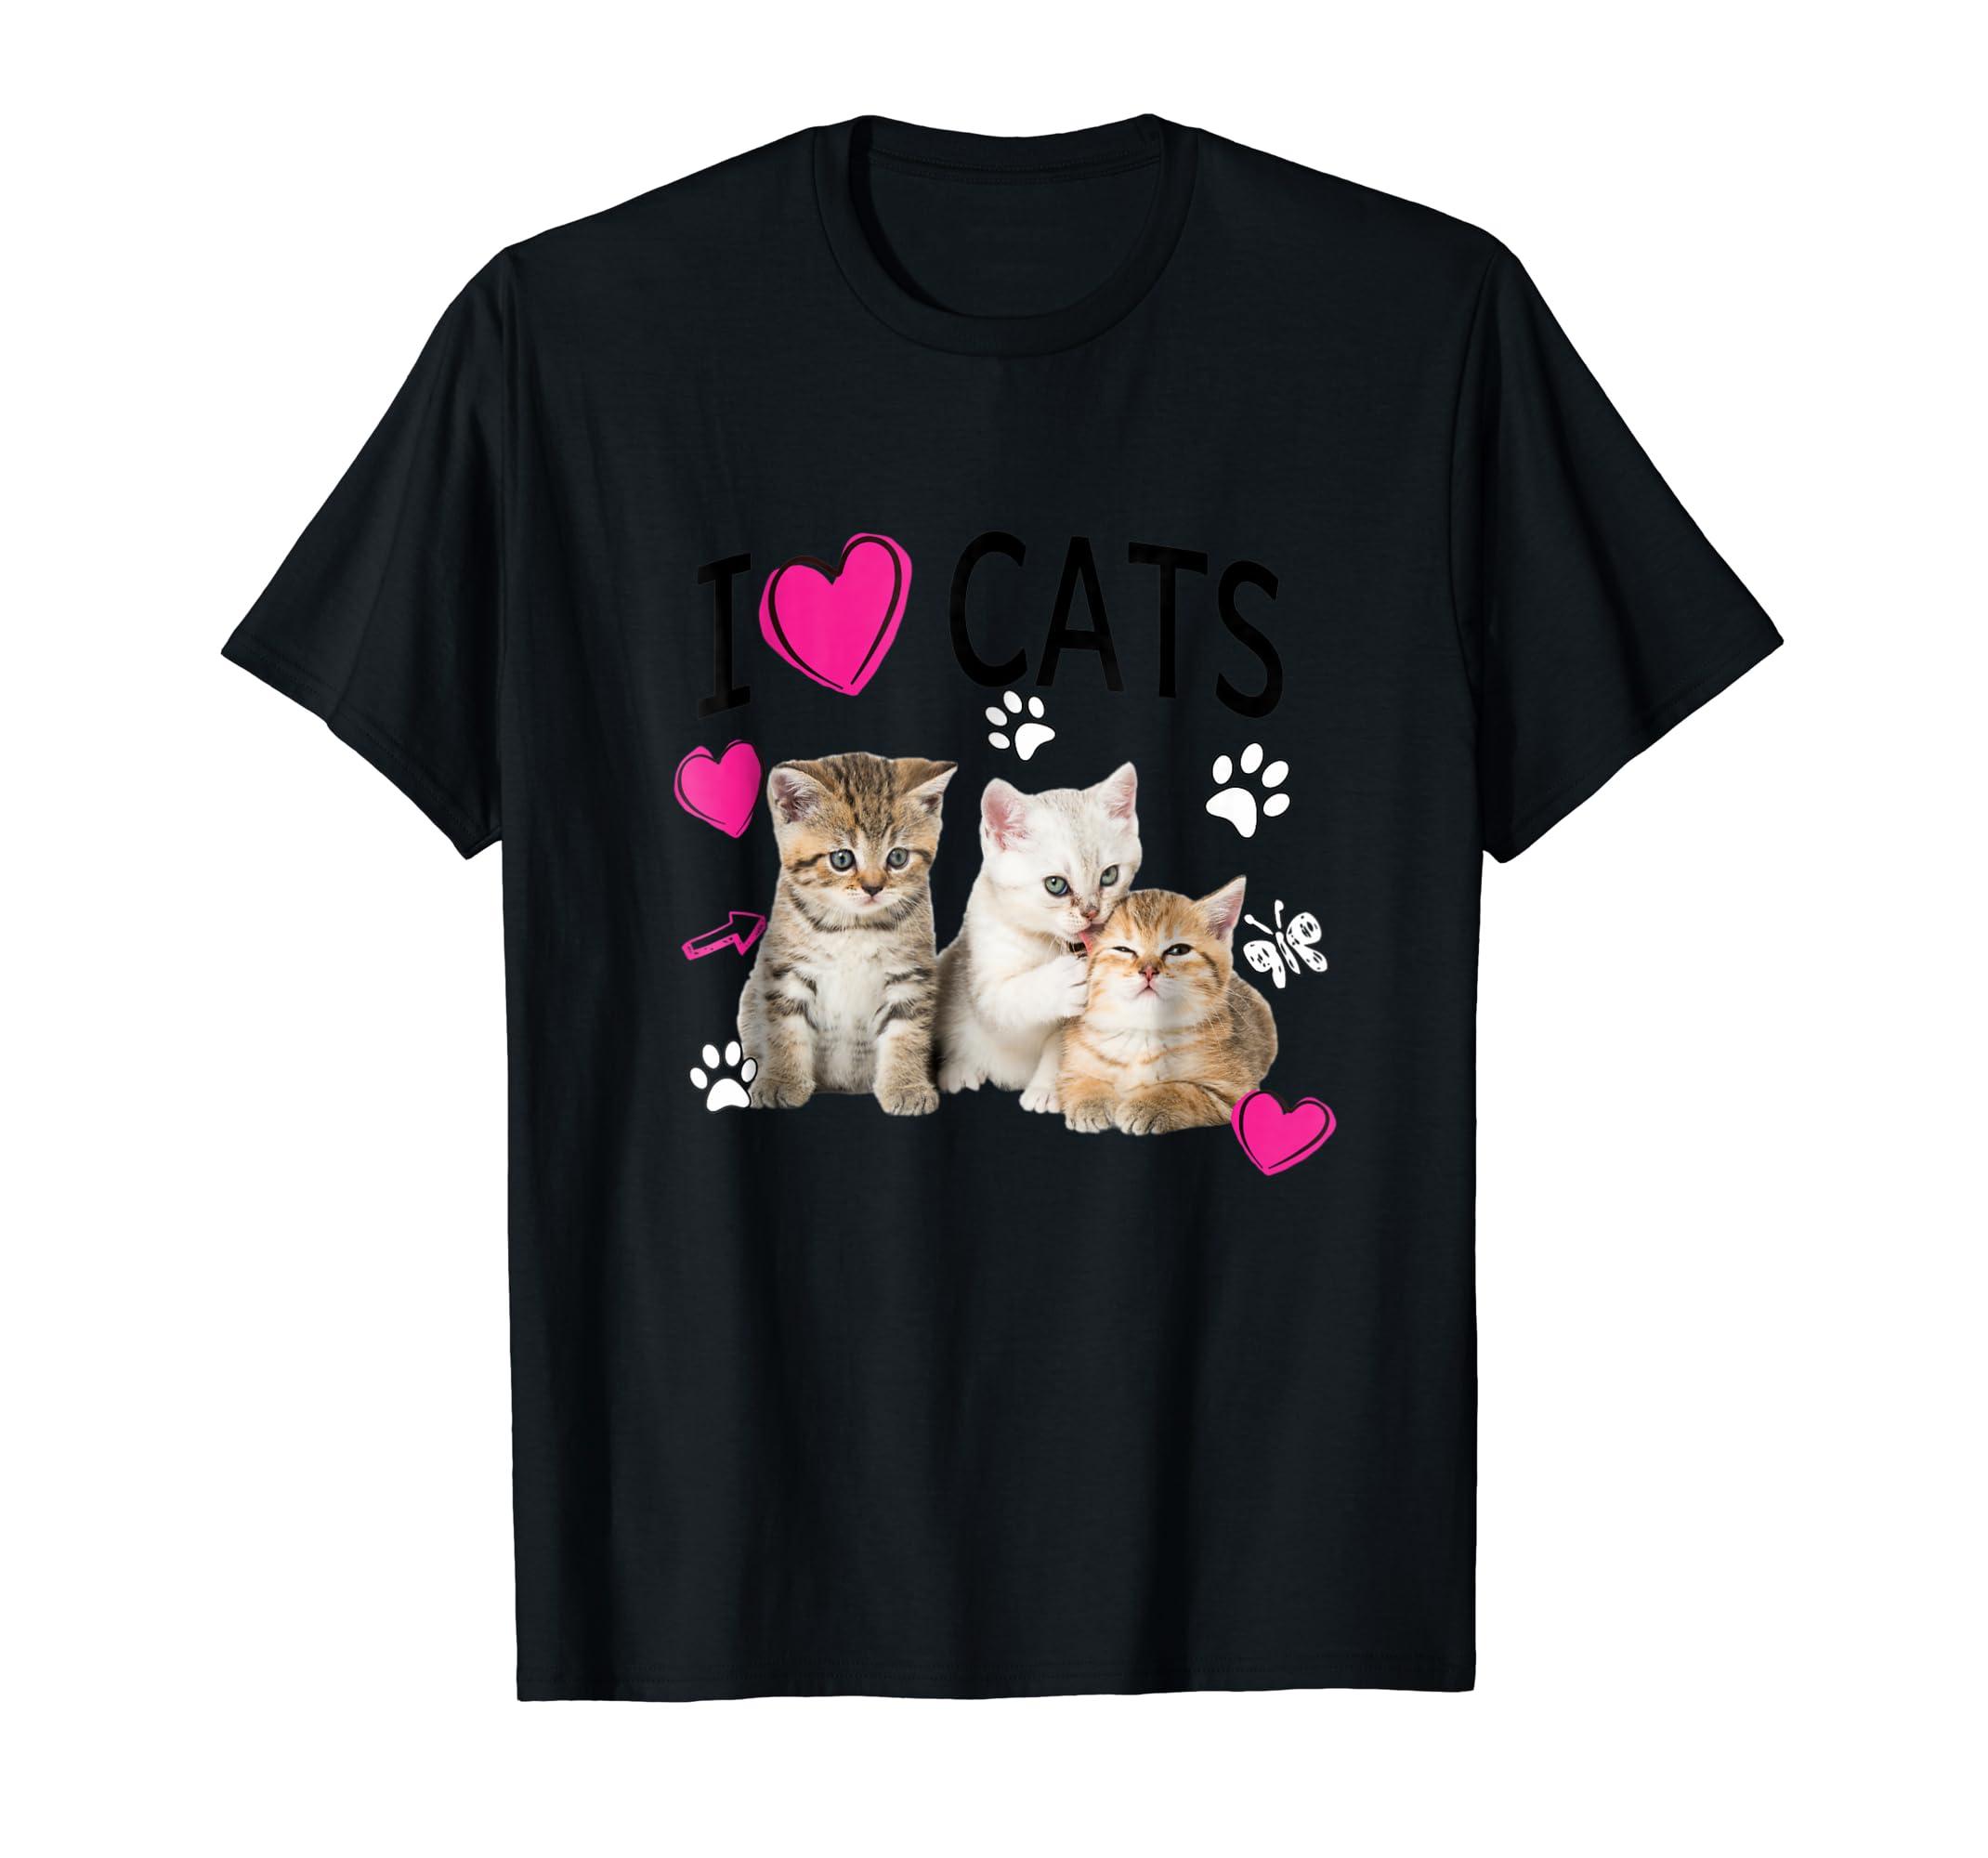 I Love Cats Shirt | Cat lover Tee - I love Kittens T-shirt-Men's T-Shirt-Black